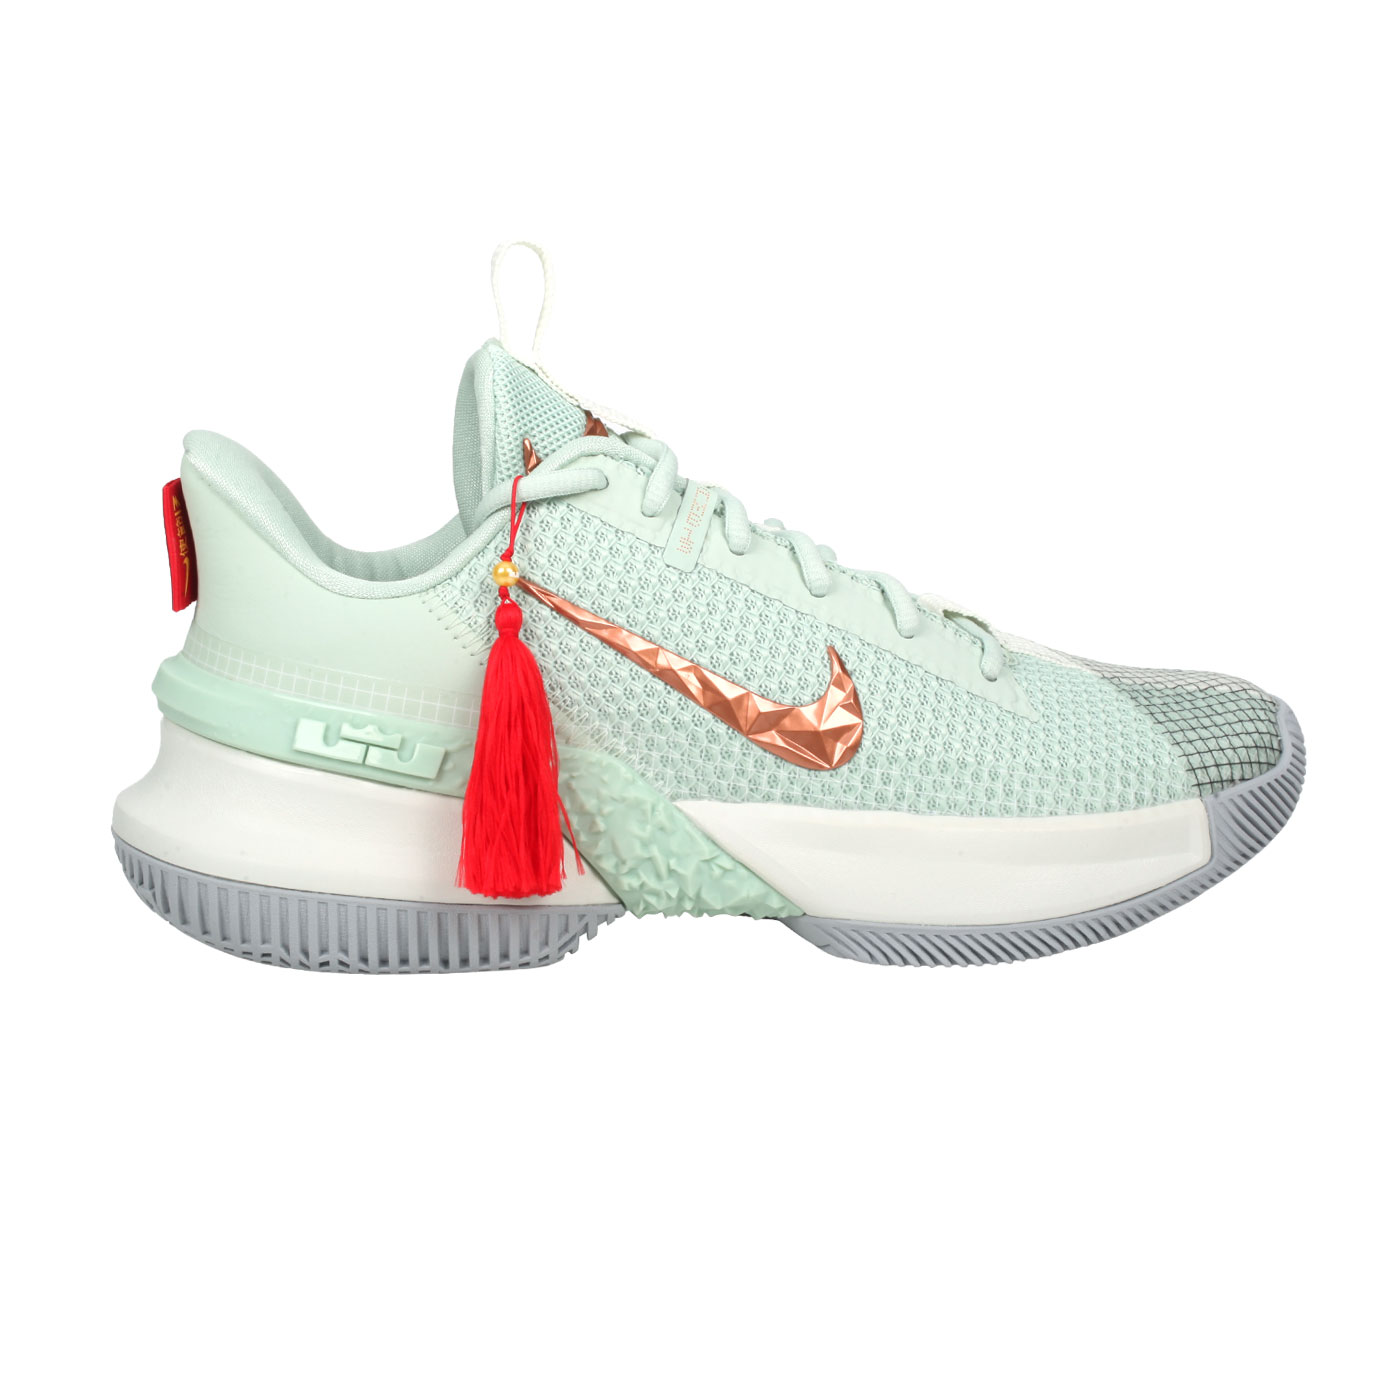 NIKE 限量-男款籃球鞋  @AMBASSADOR XIII@CQ9329300